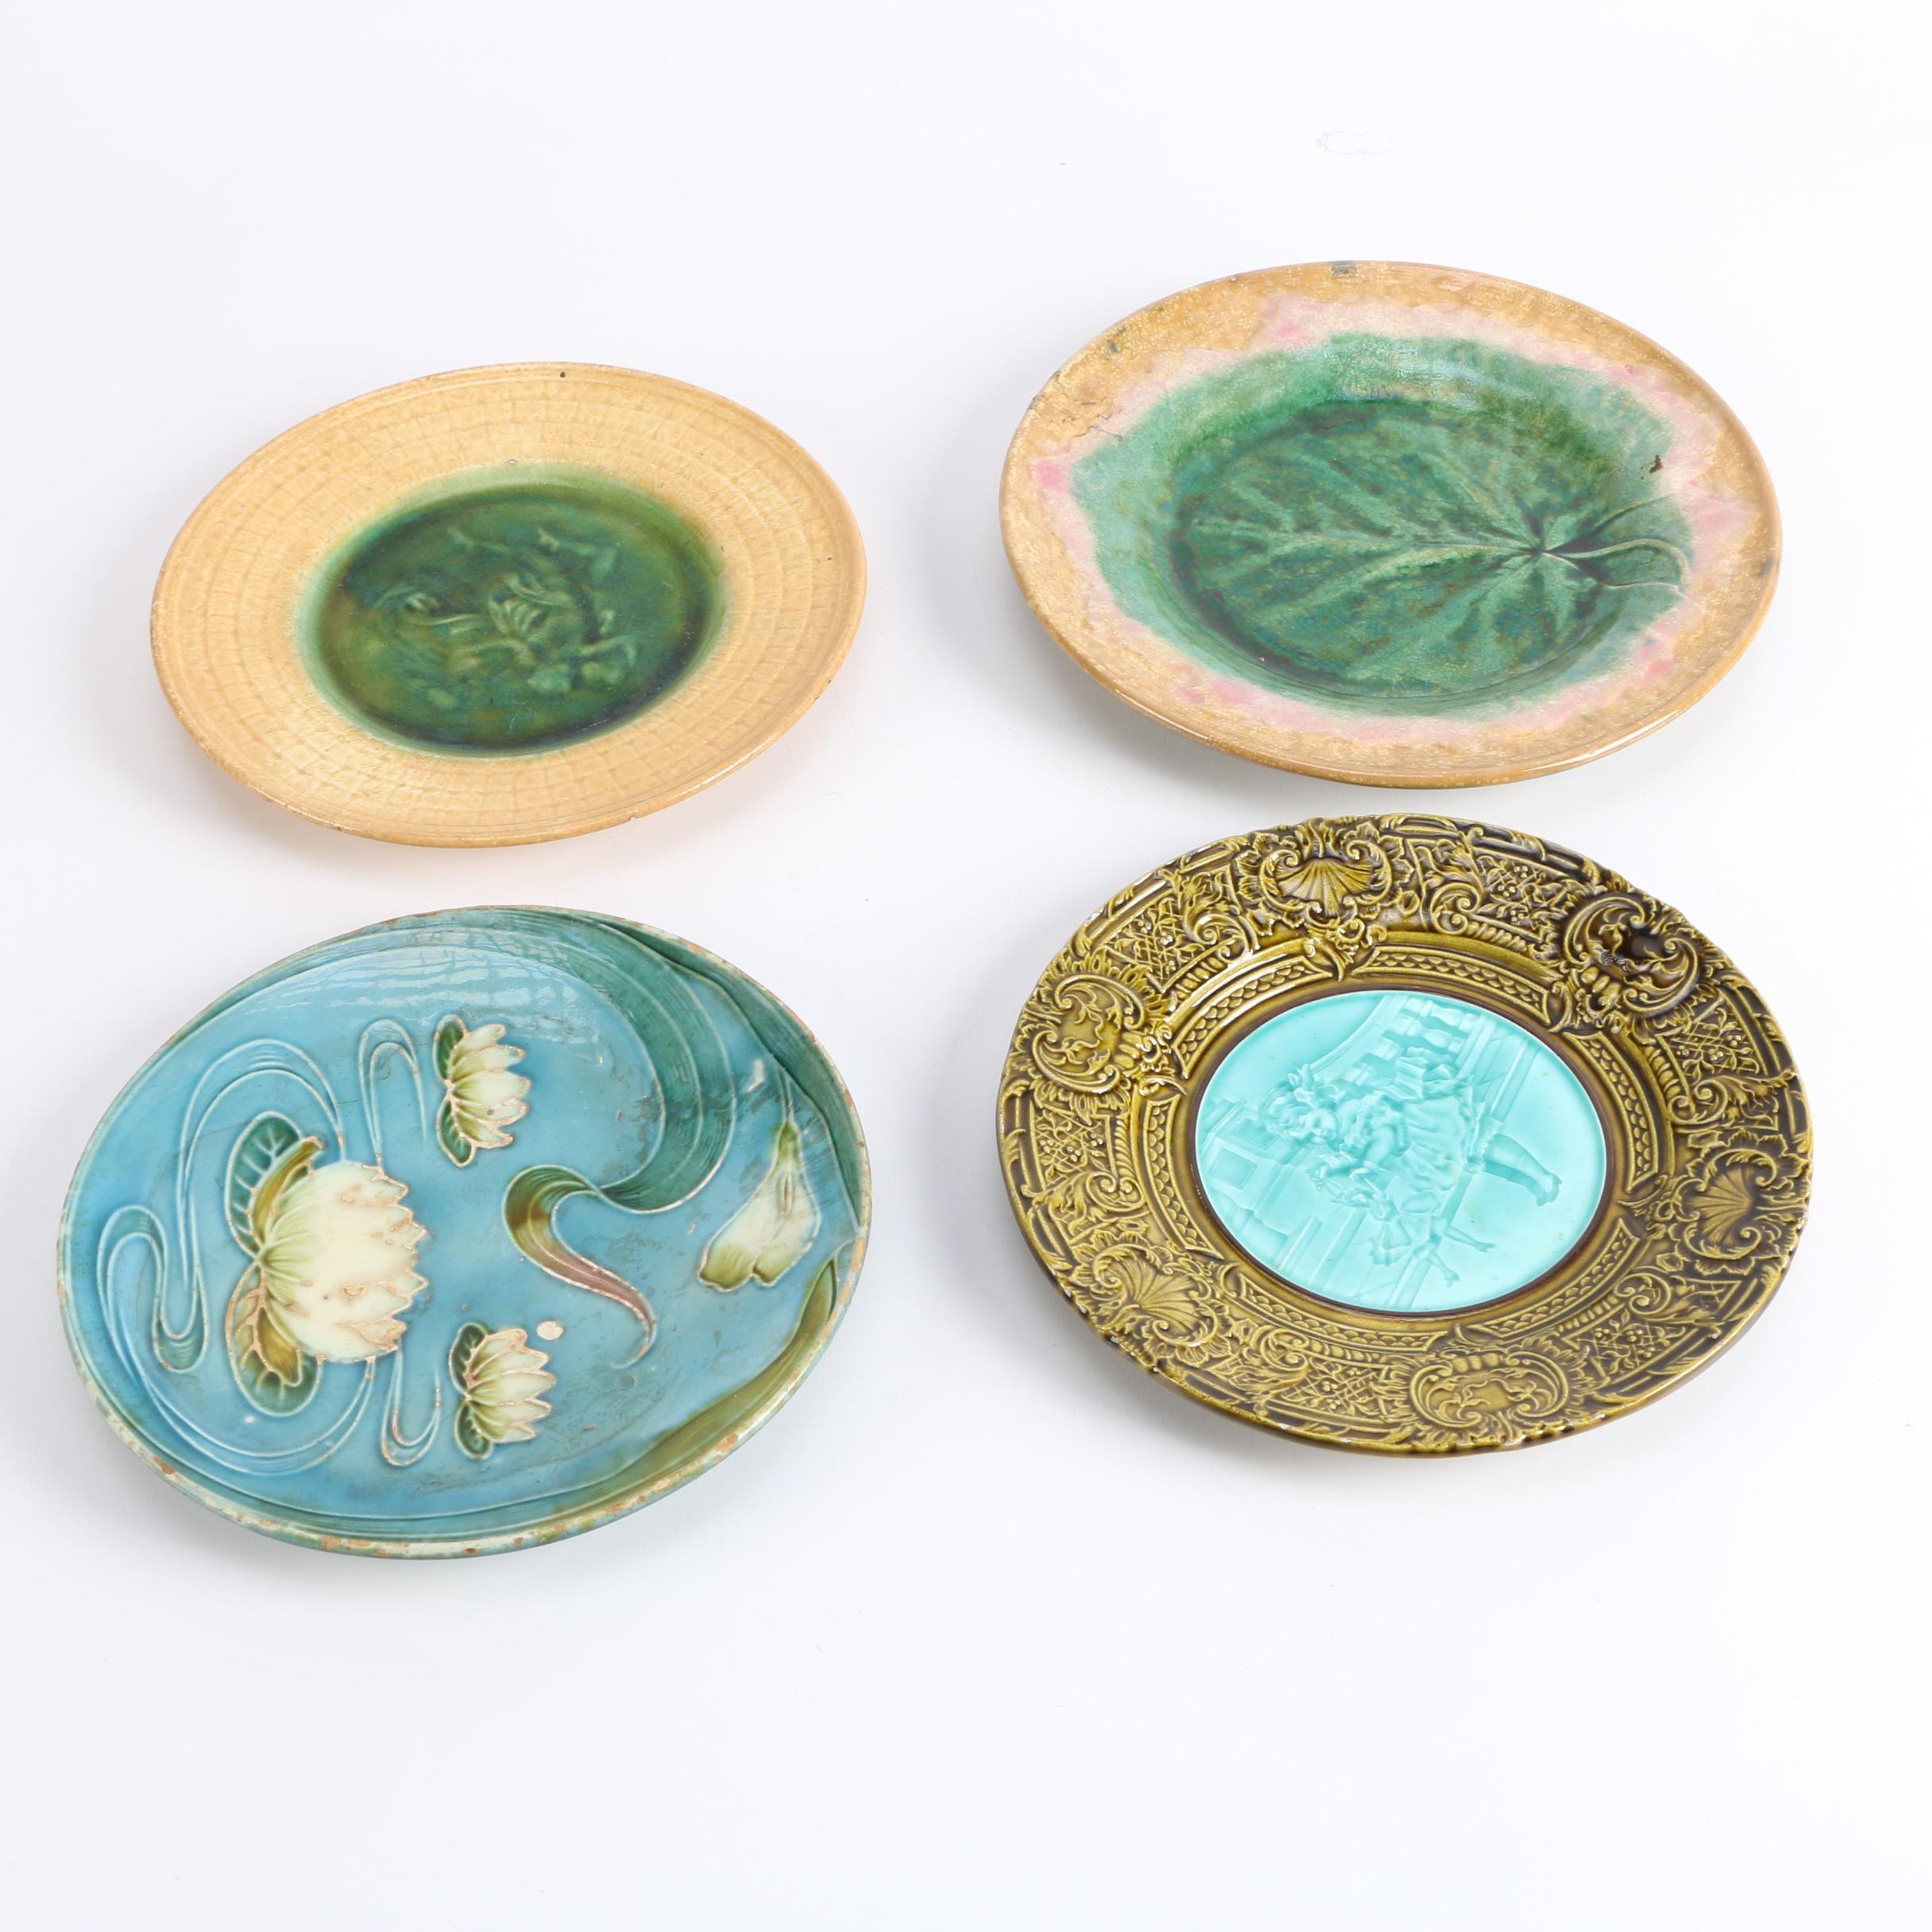 Decorative Majolica Plates Including Etruscan Majolica